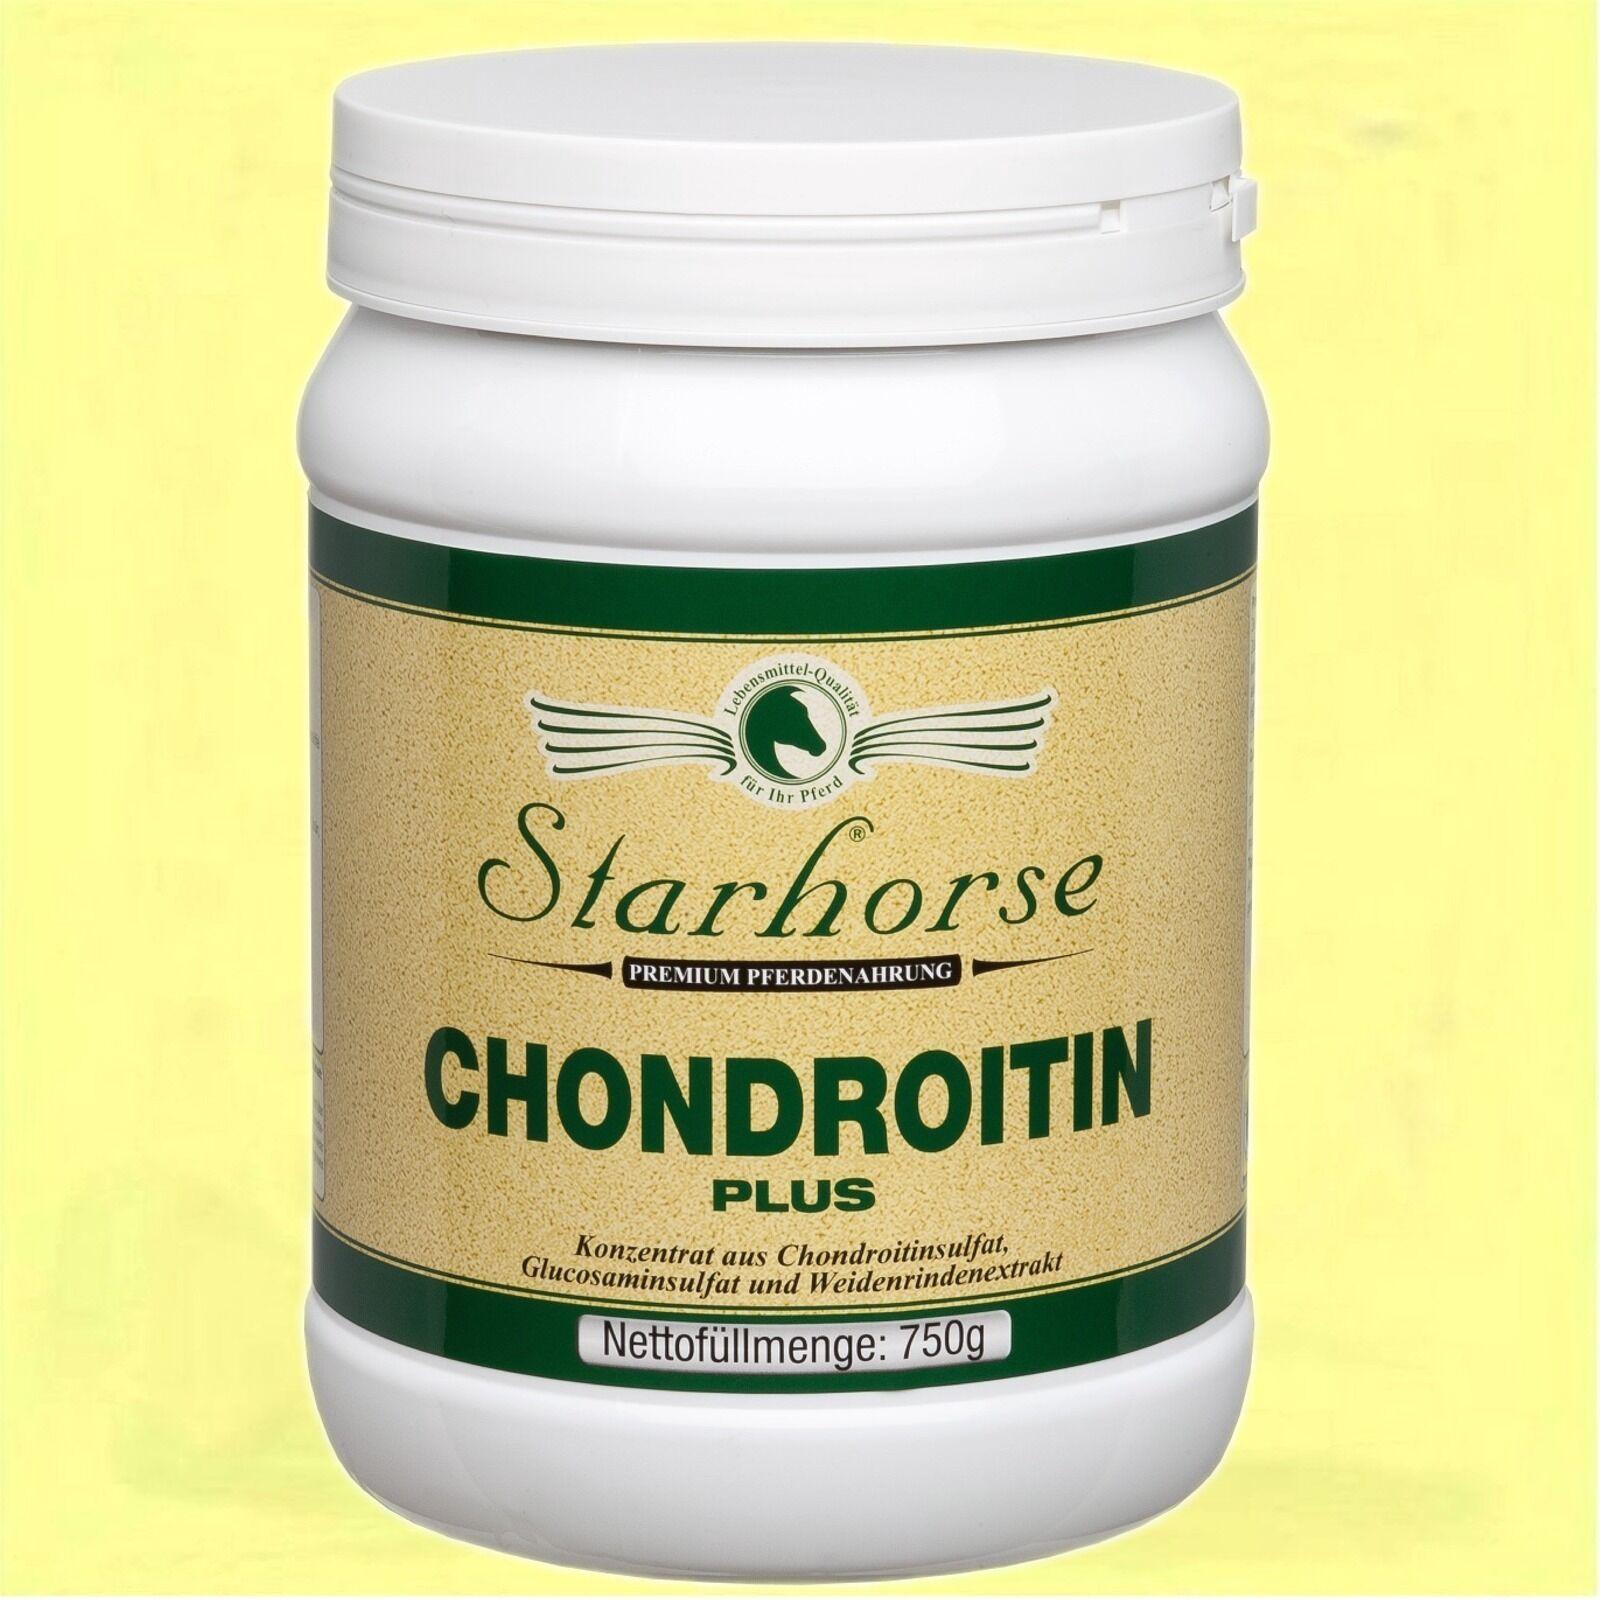 Starhorse Chondroitin Plus 750g Dose Glucosamin GAG Bewegungsapparat Pferde